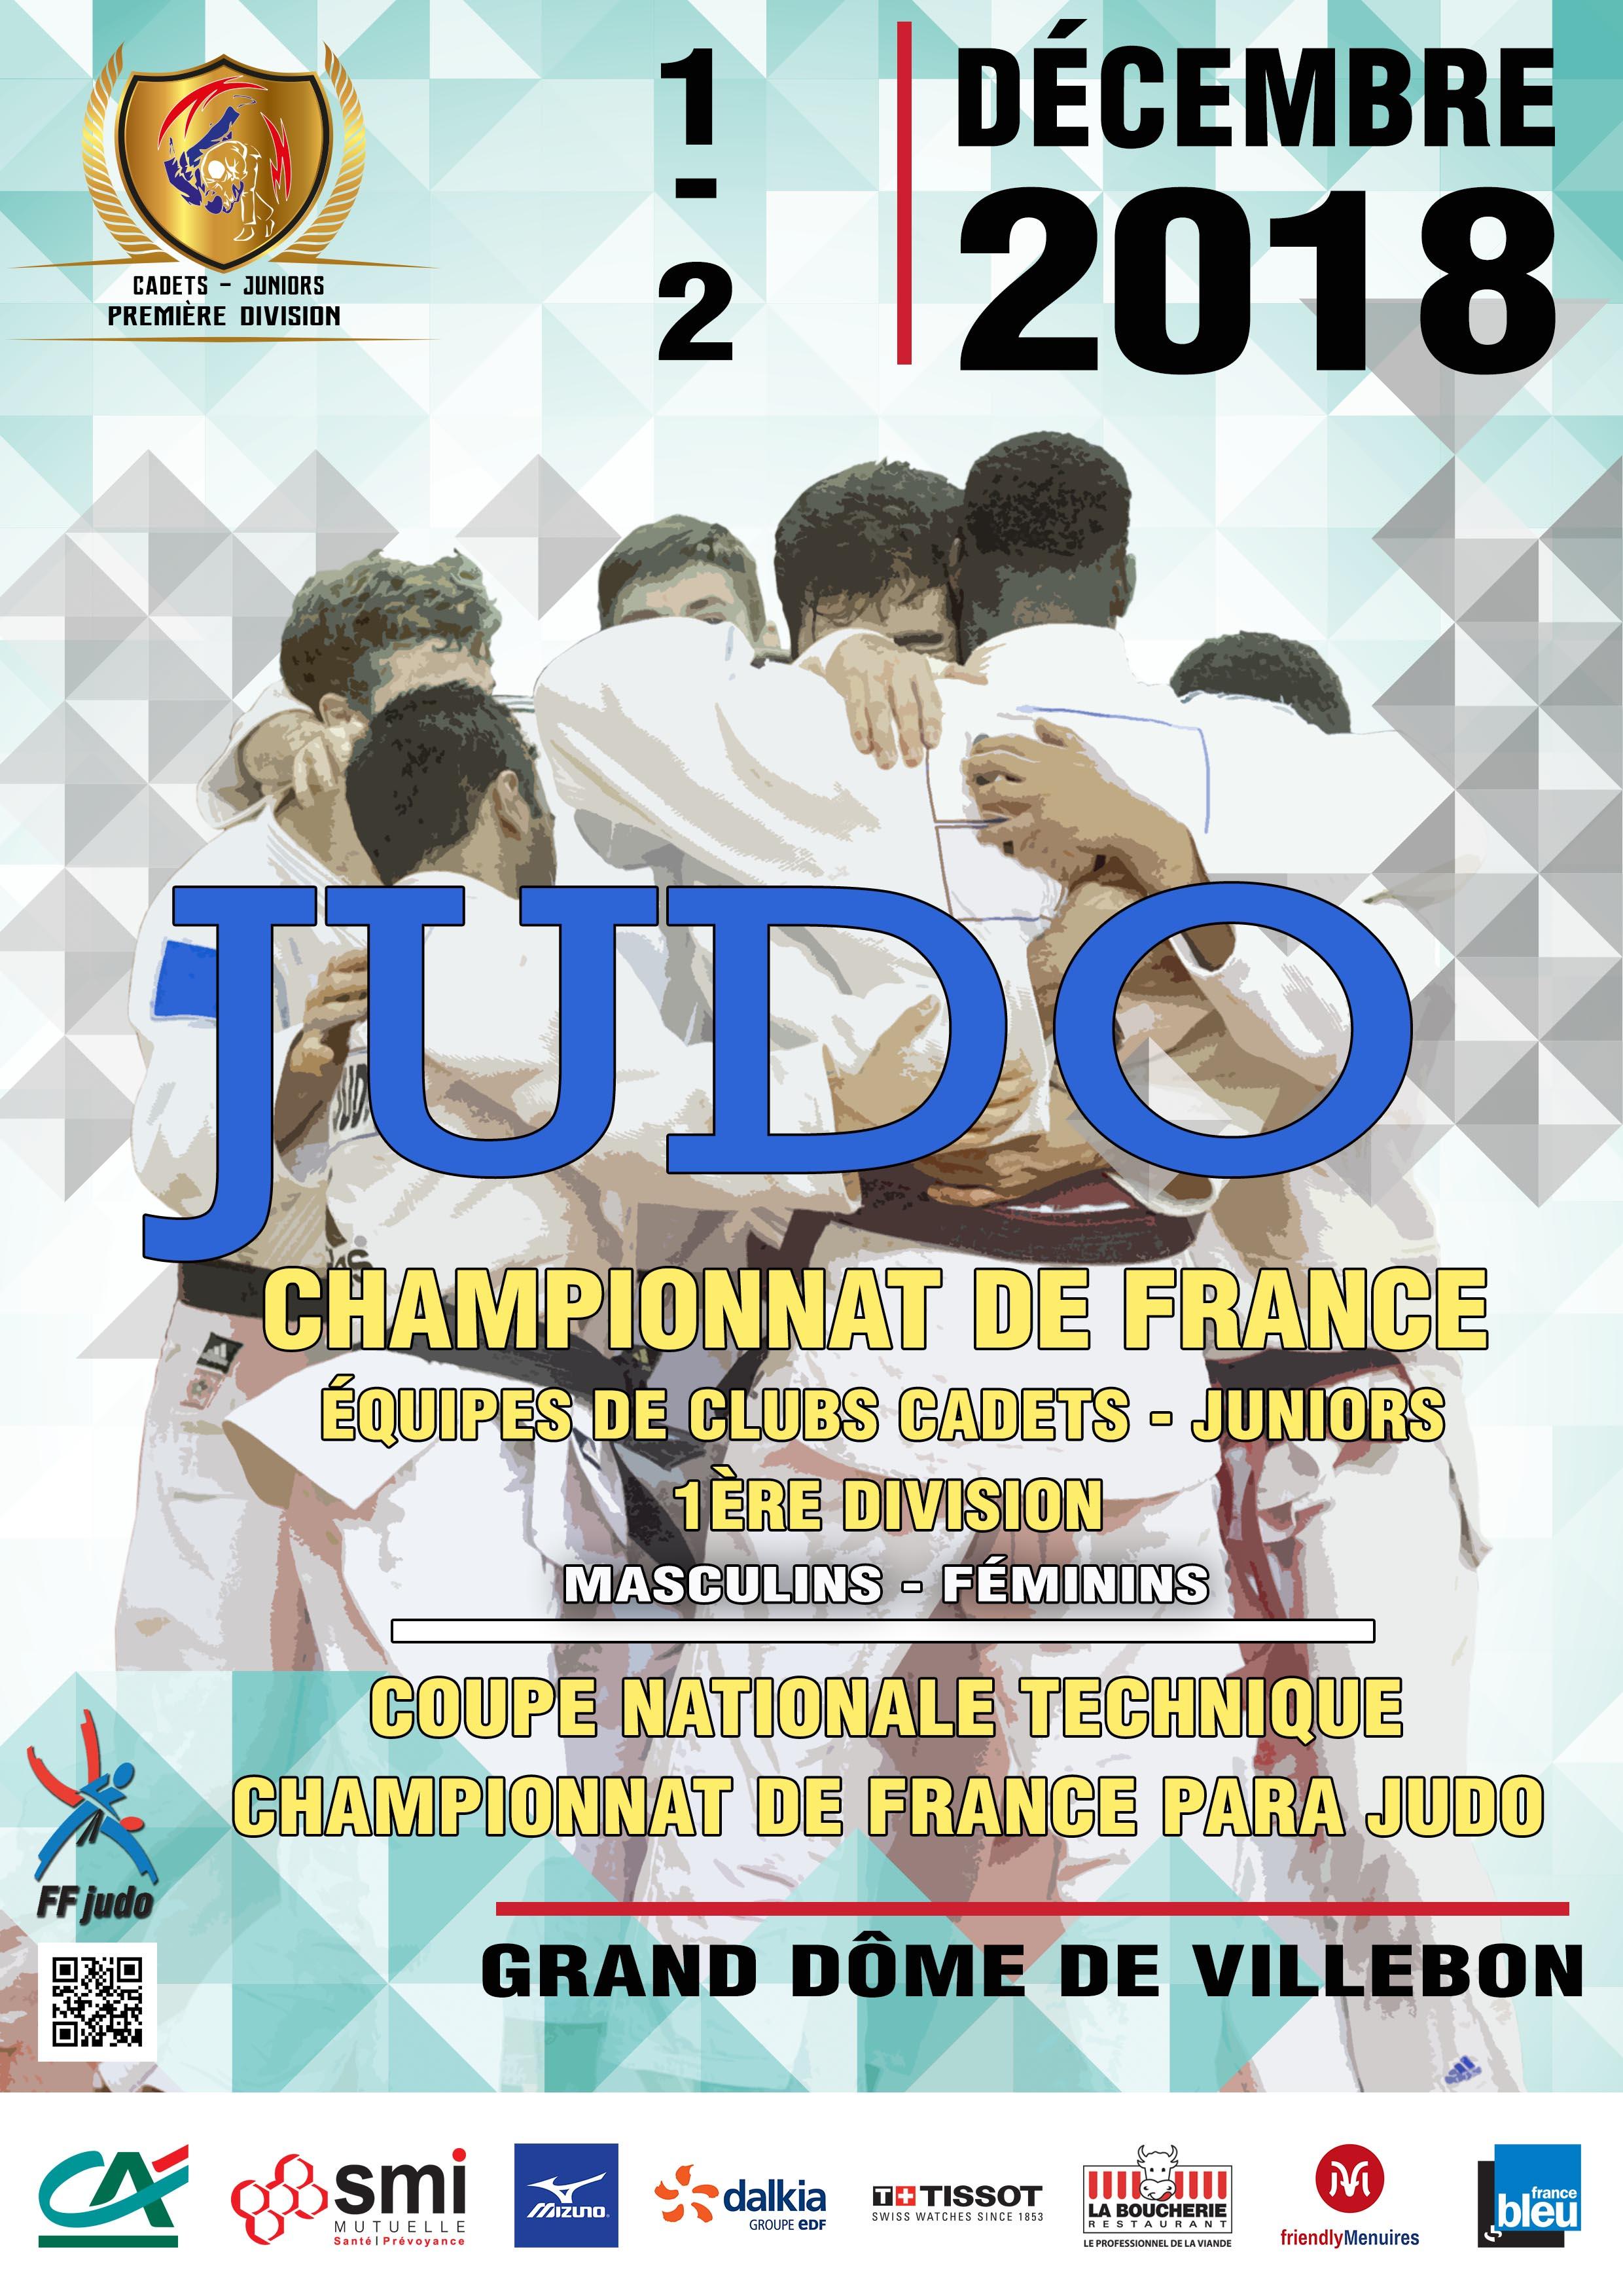 CHAMPIONNAT DE FRANCE PAR ÉQUIPES DE CLUBS CADETS / JUNIORS